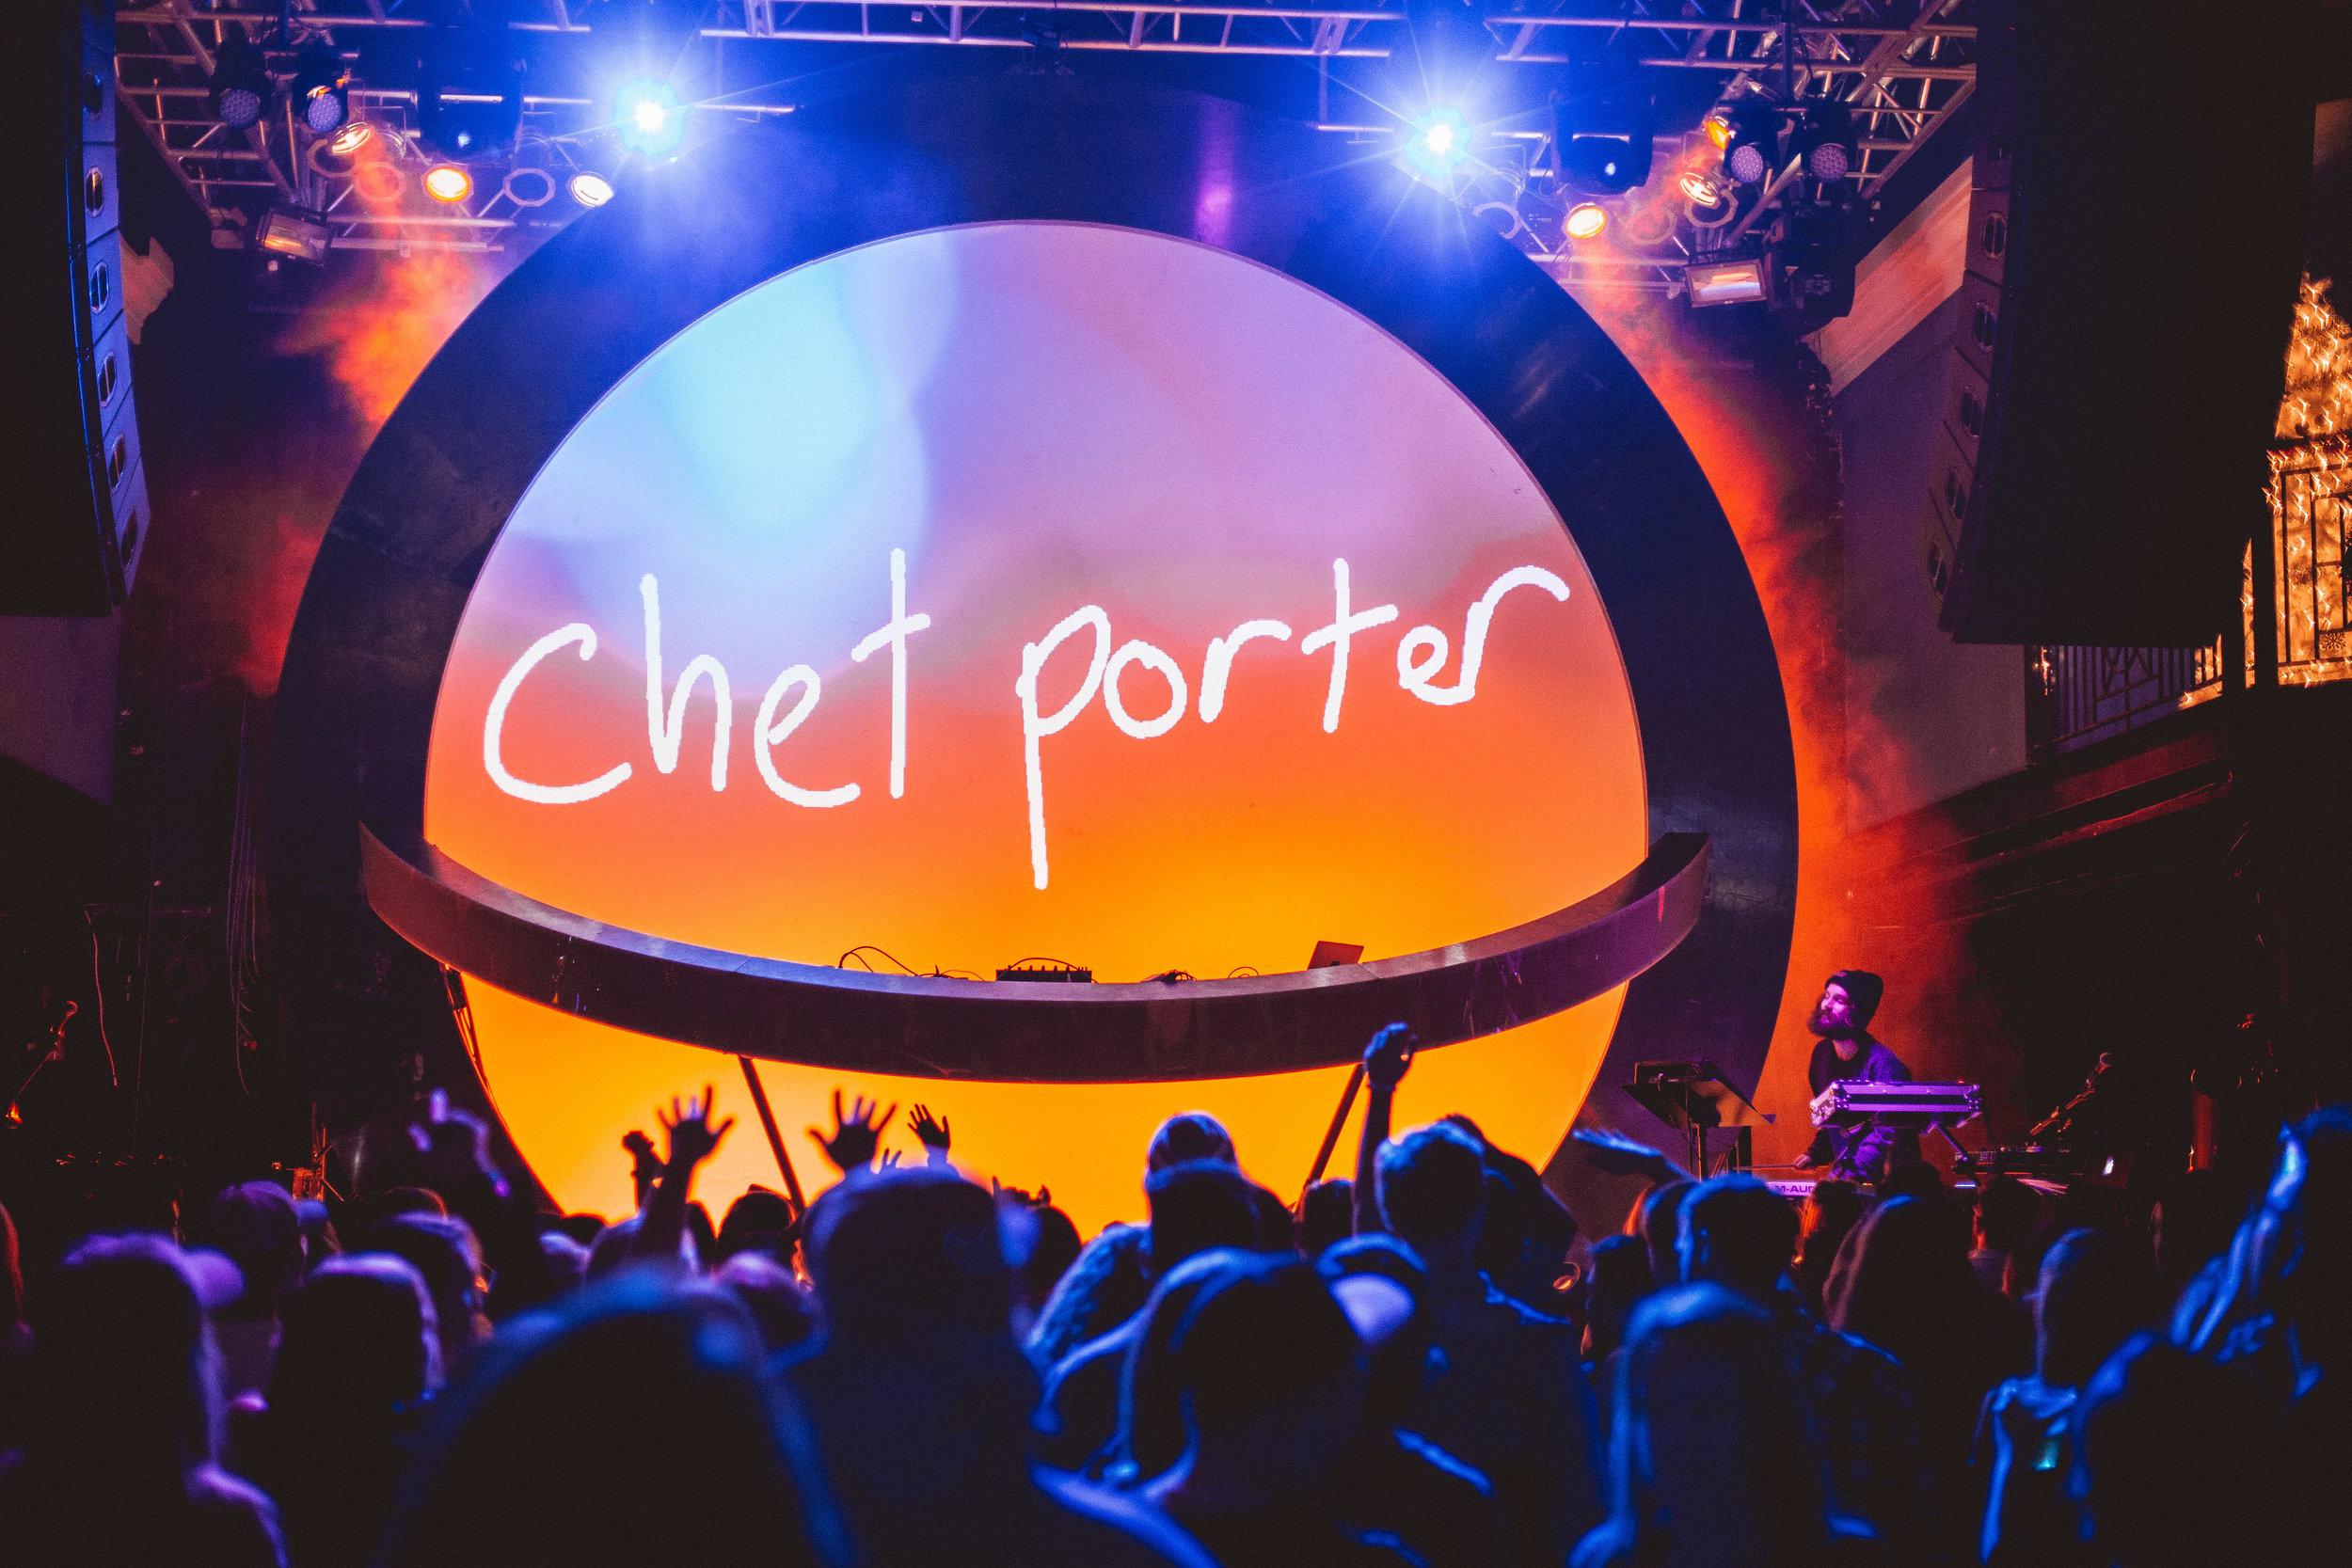 Chet Porter @ 9-30 Club Preview-1.jpg